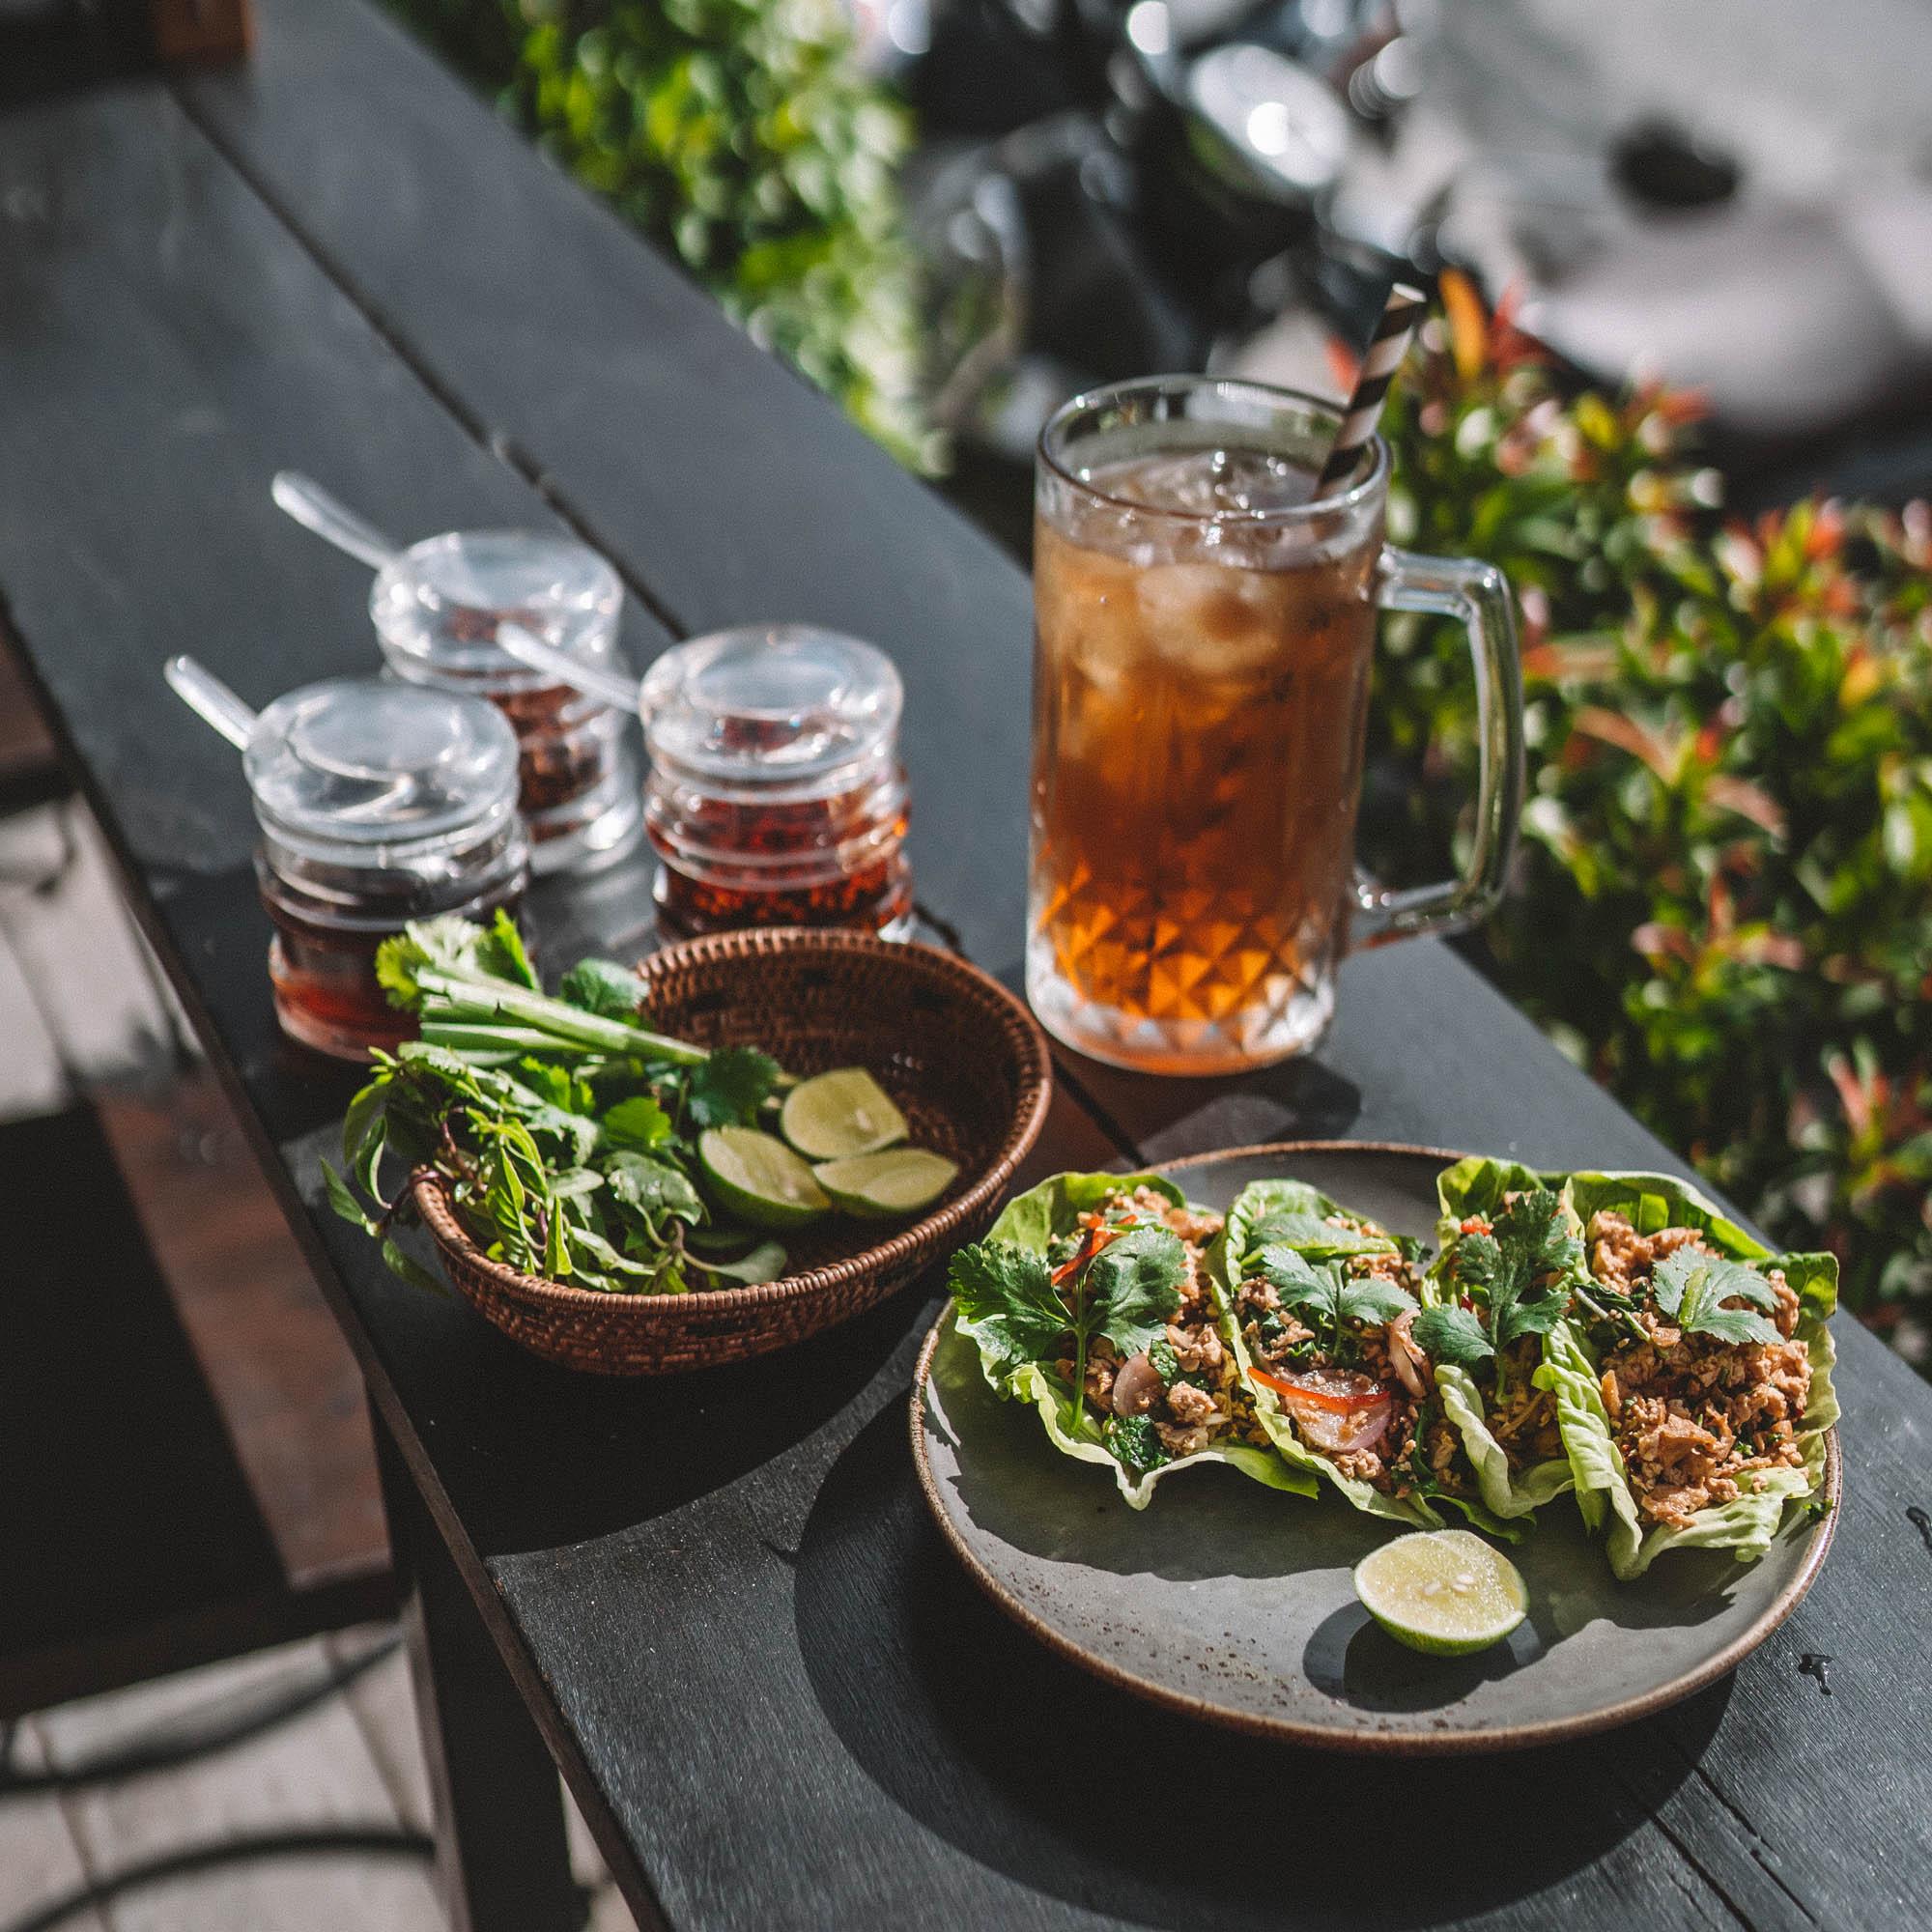 keira-mason-bangkok-hustle-thai-food.jpg